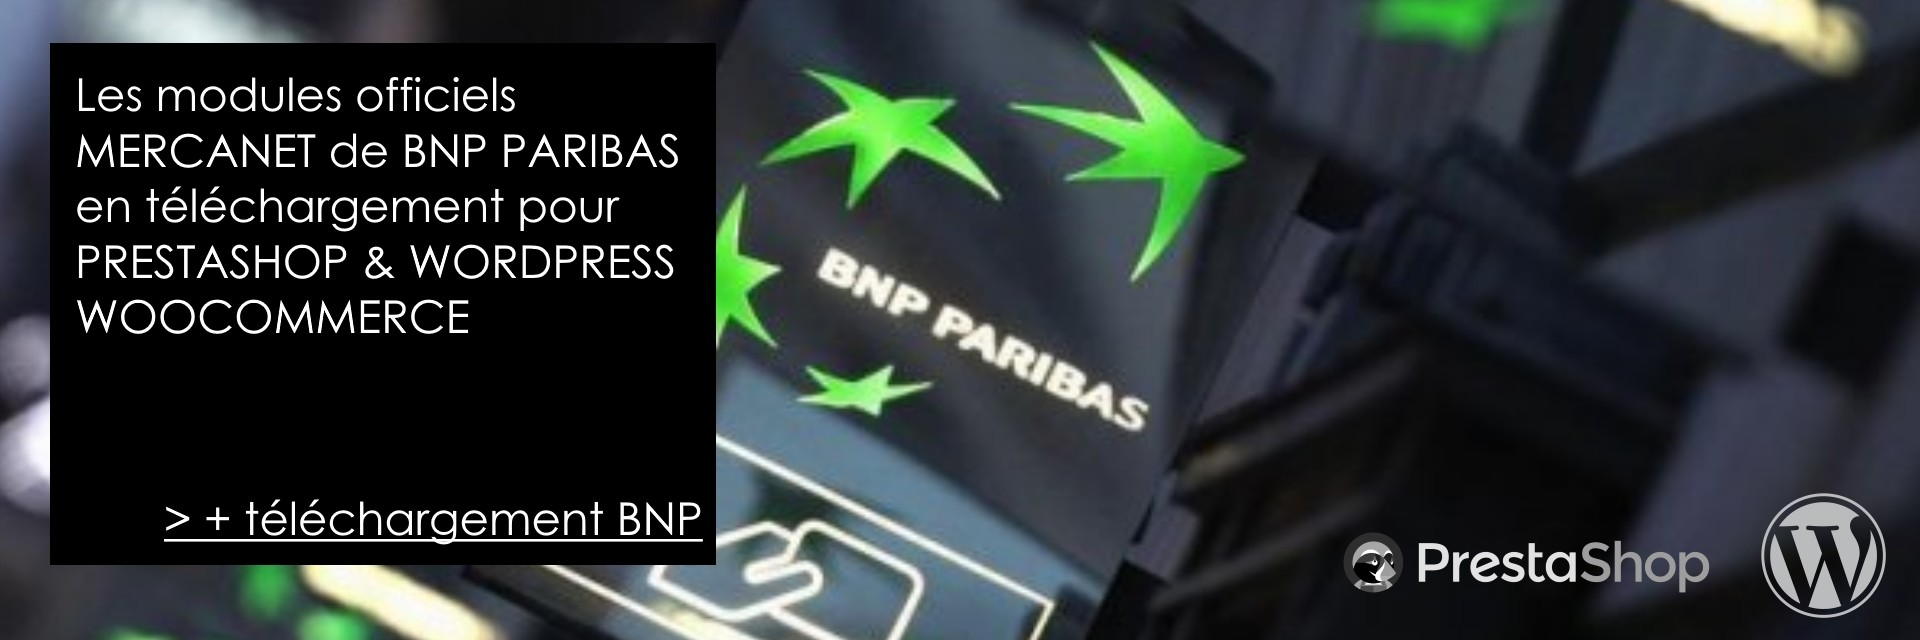 Module de paiement BNP MERCANET